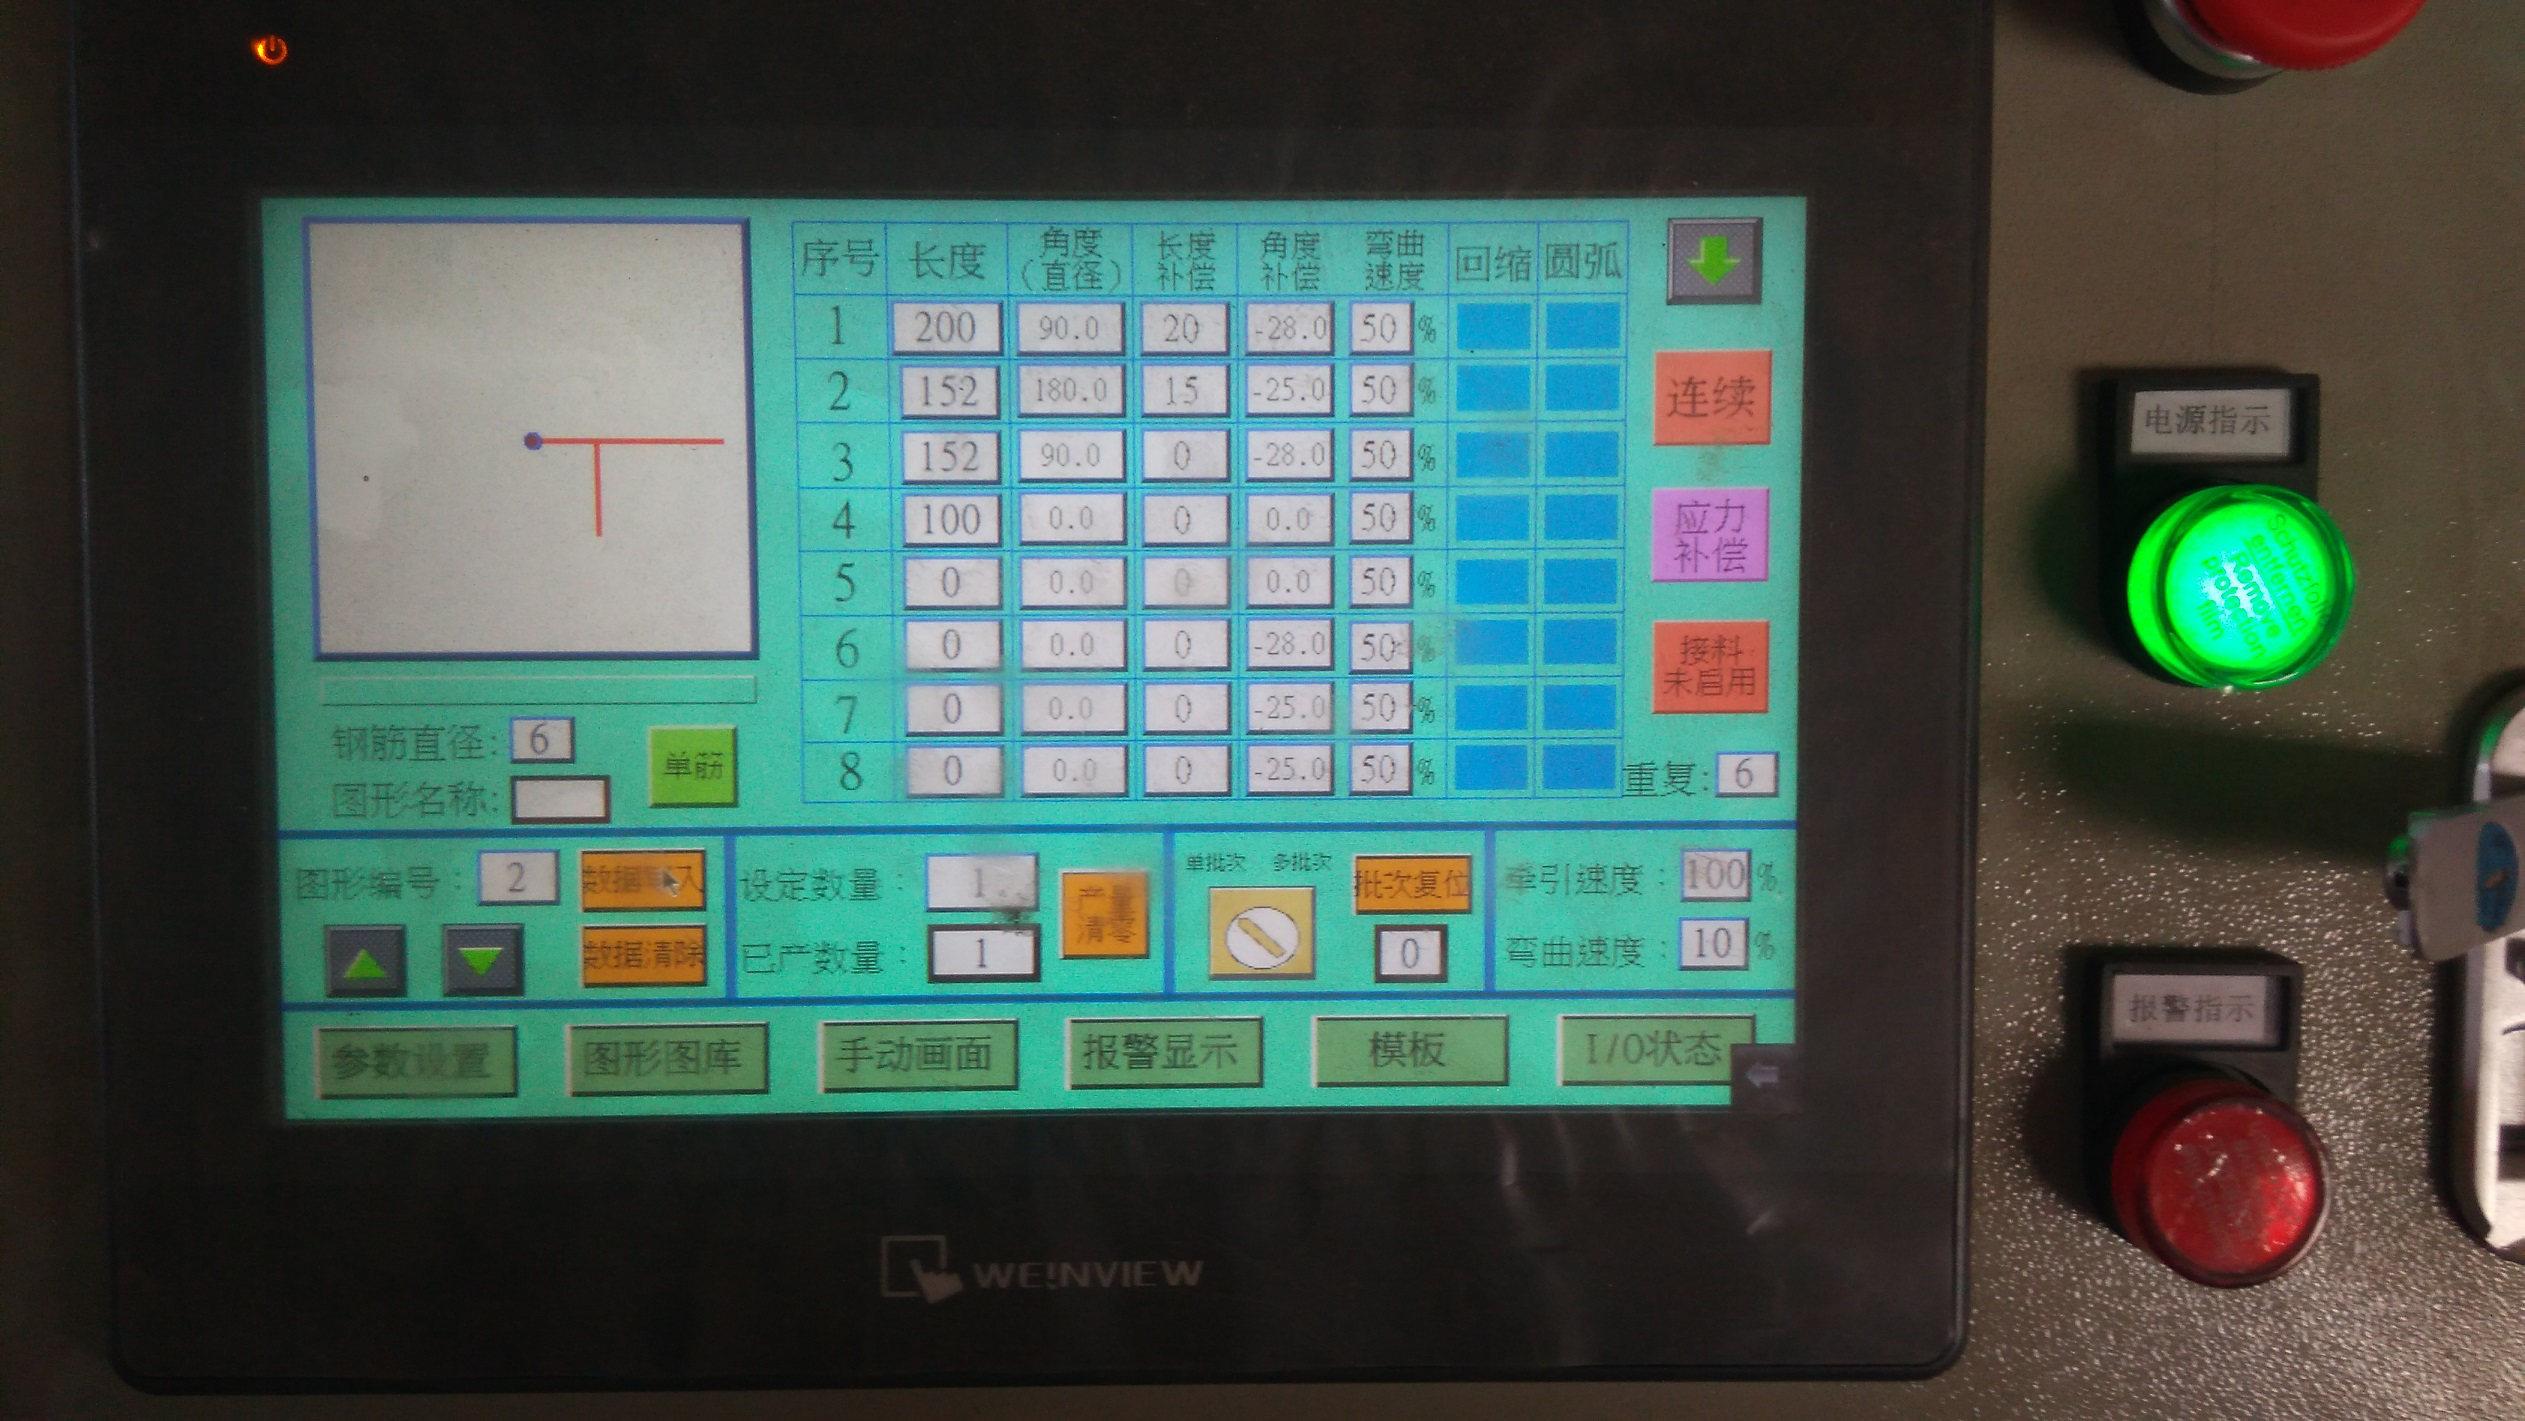 CNC-trådböjningsmaskin